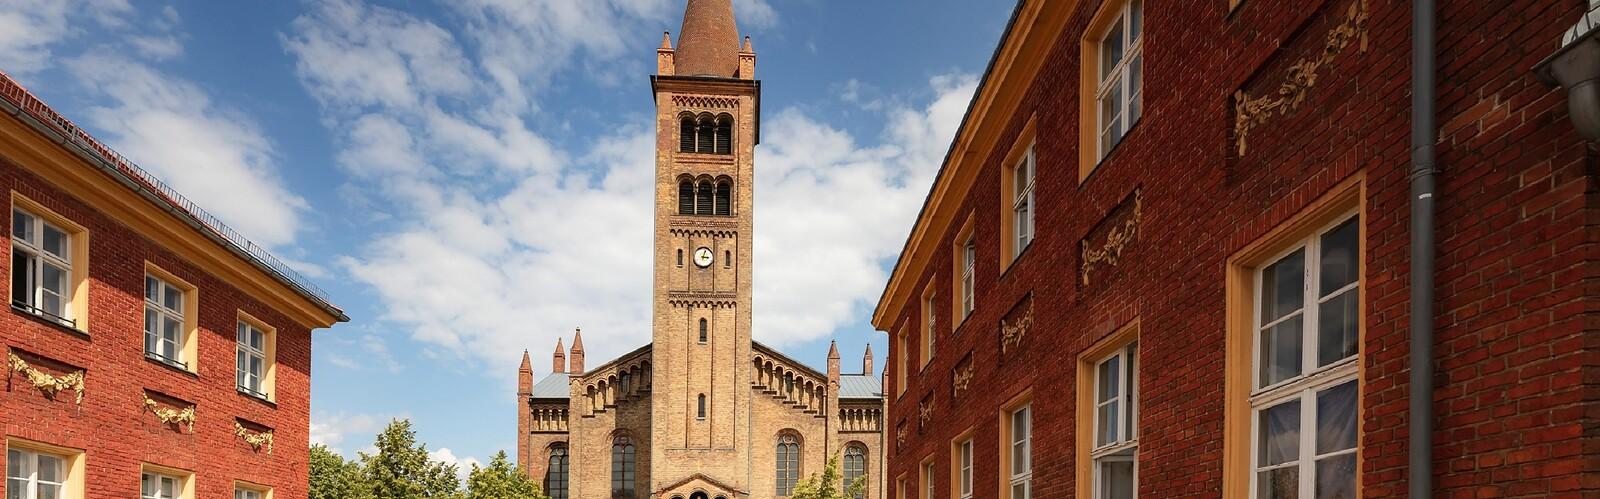 St. Peter und Paul Kirche , Foto: André Stiebitz , Lizenz: PMSG